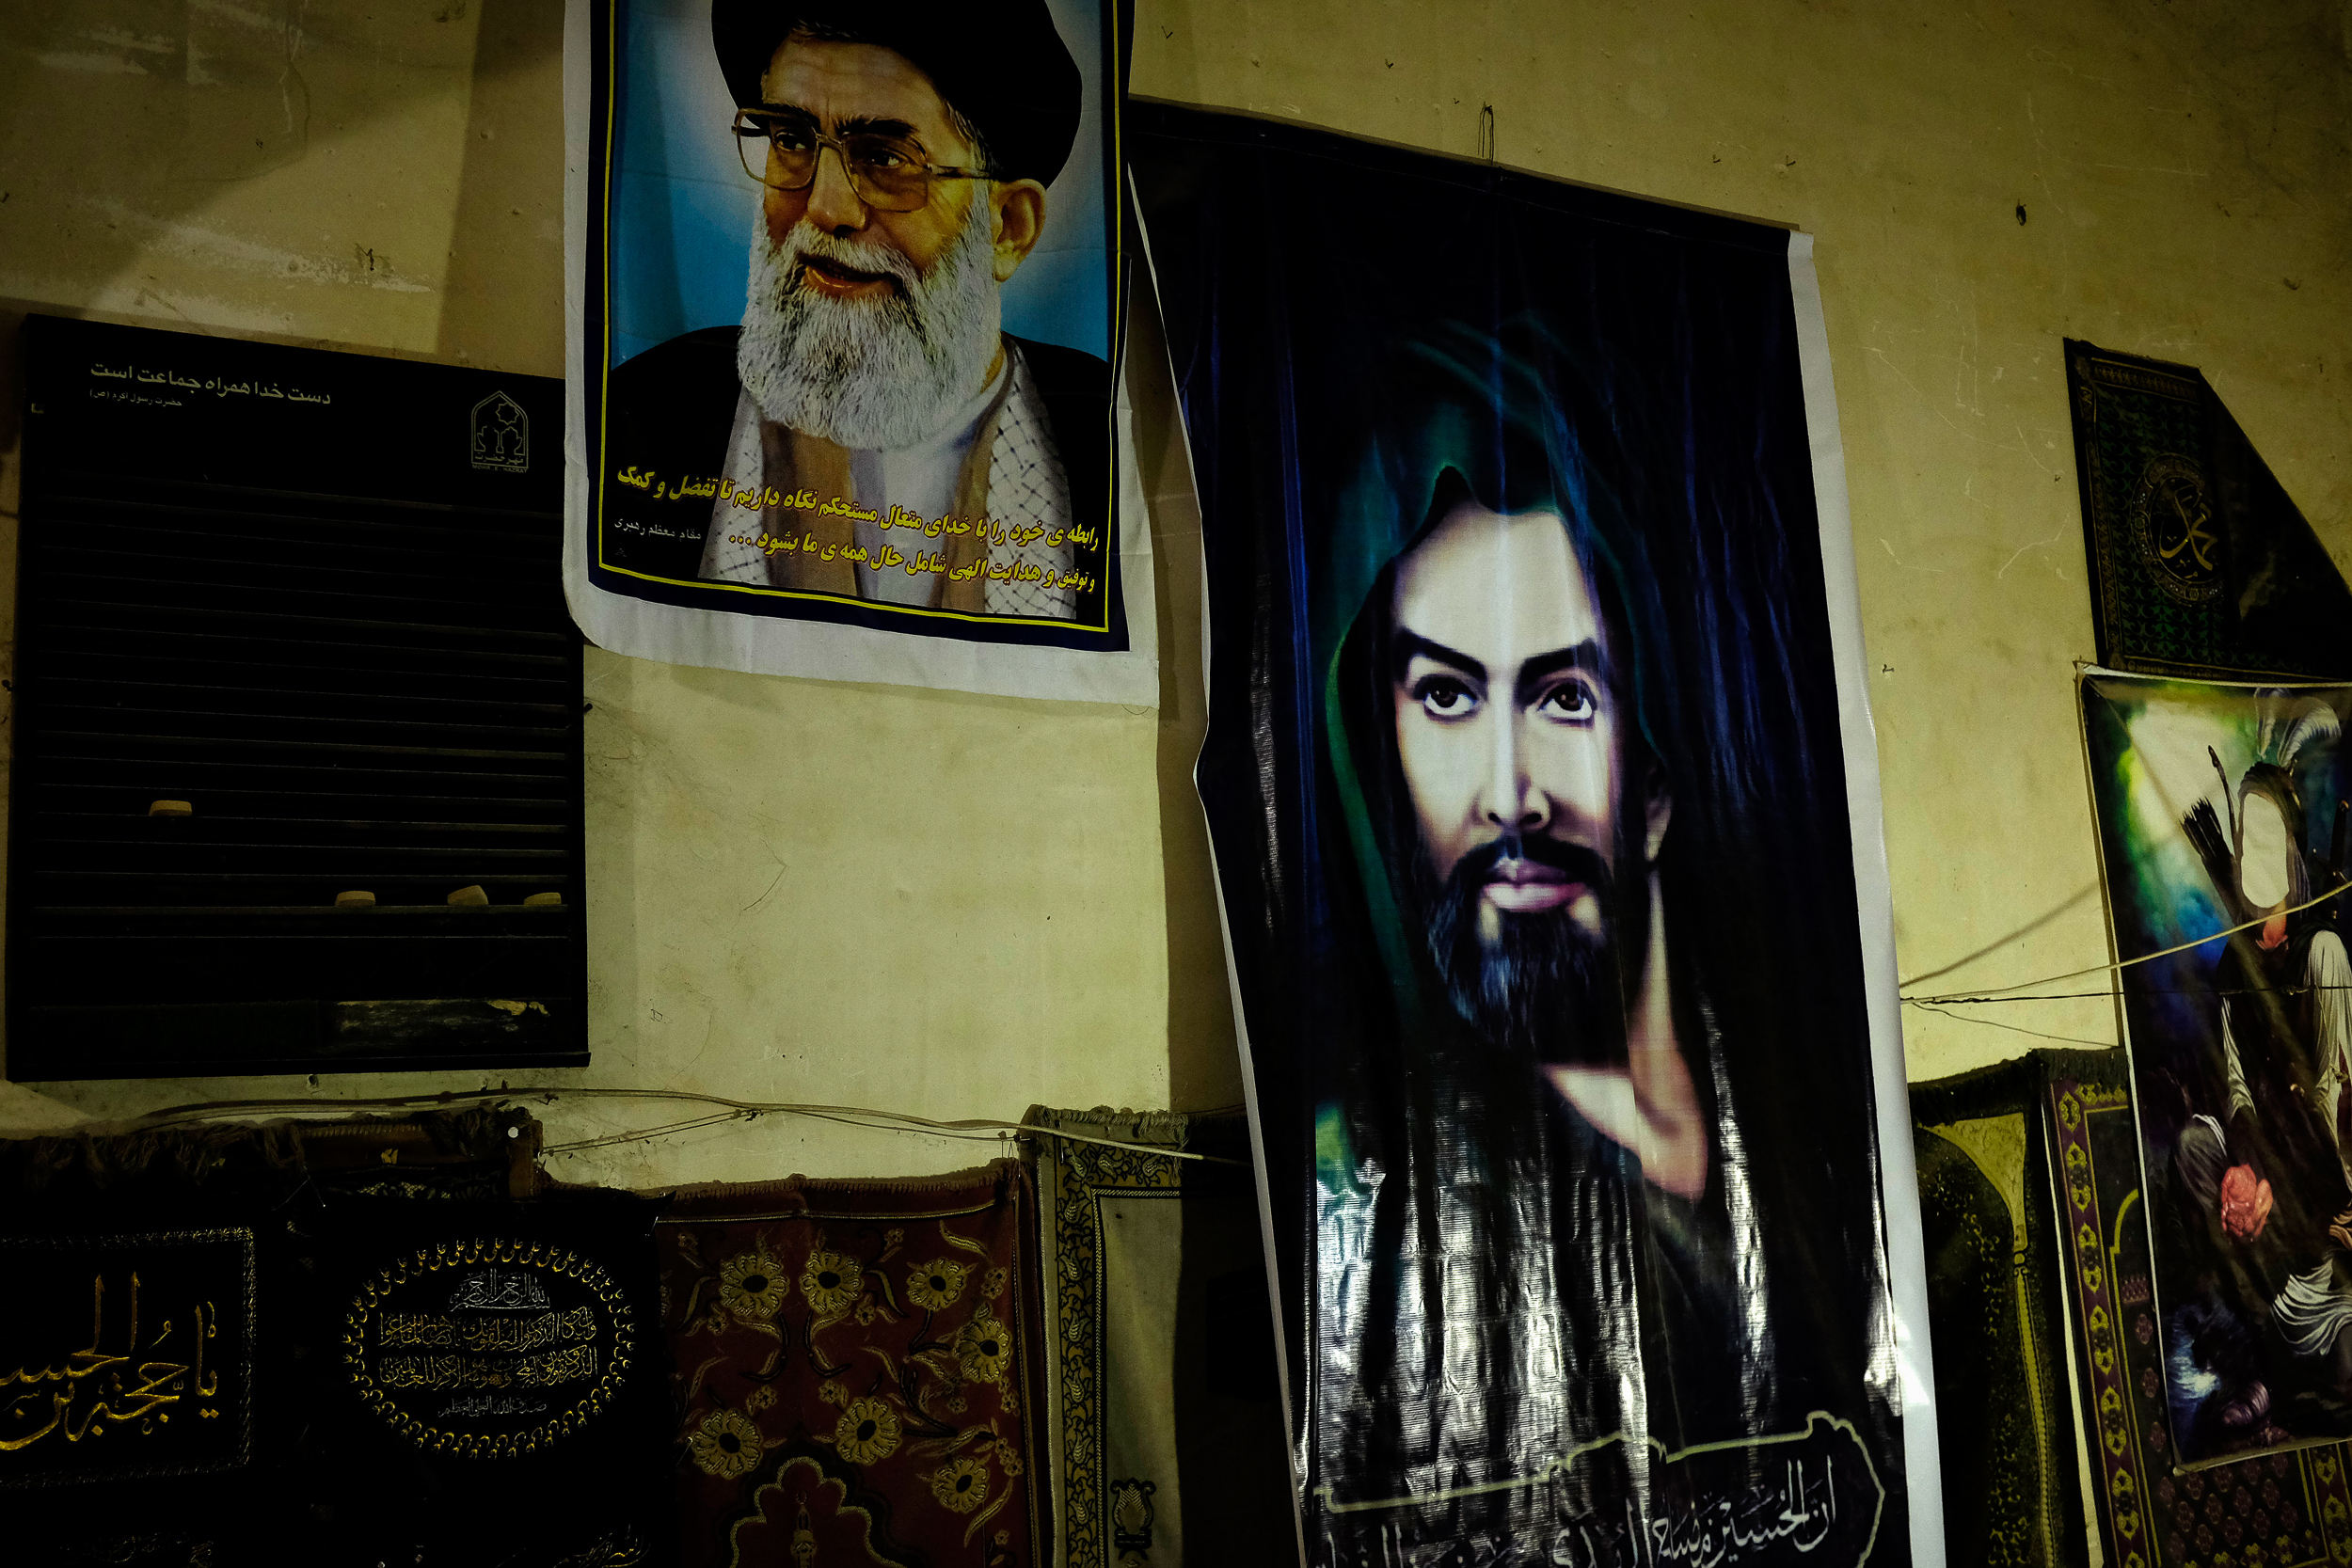 The Supreme Leader, Ayatollah Khamenei is depicted next to the Prophet Ali in a bazaar in Shiraz.